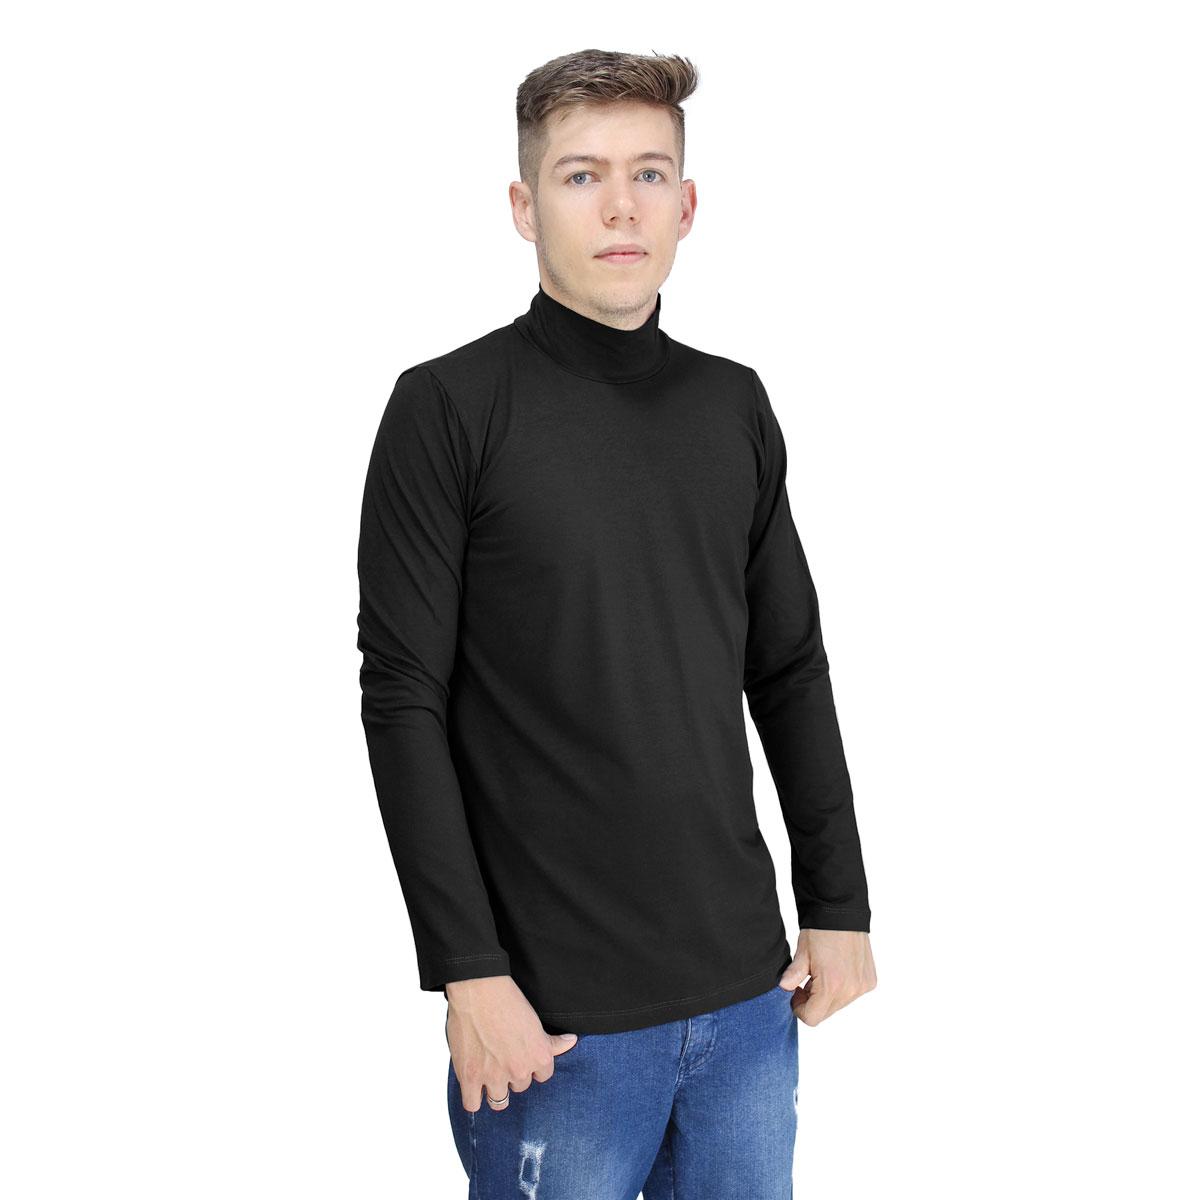 Camiseta Masculina Gola Alta Cacharrel Manga Longa Lynnce